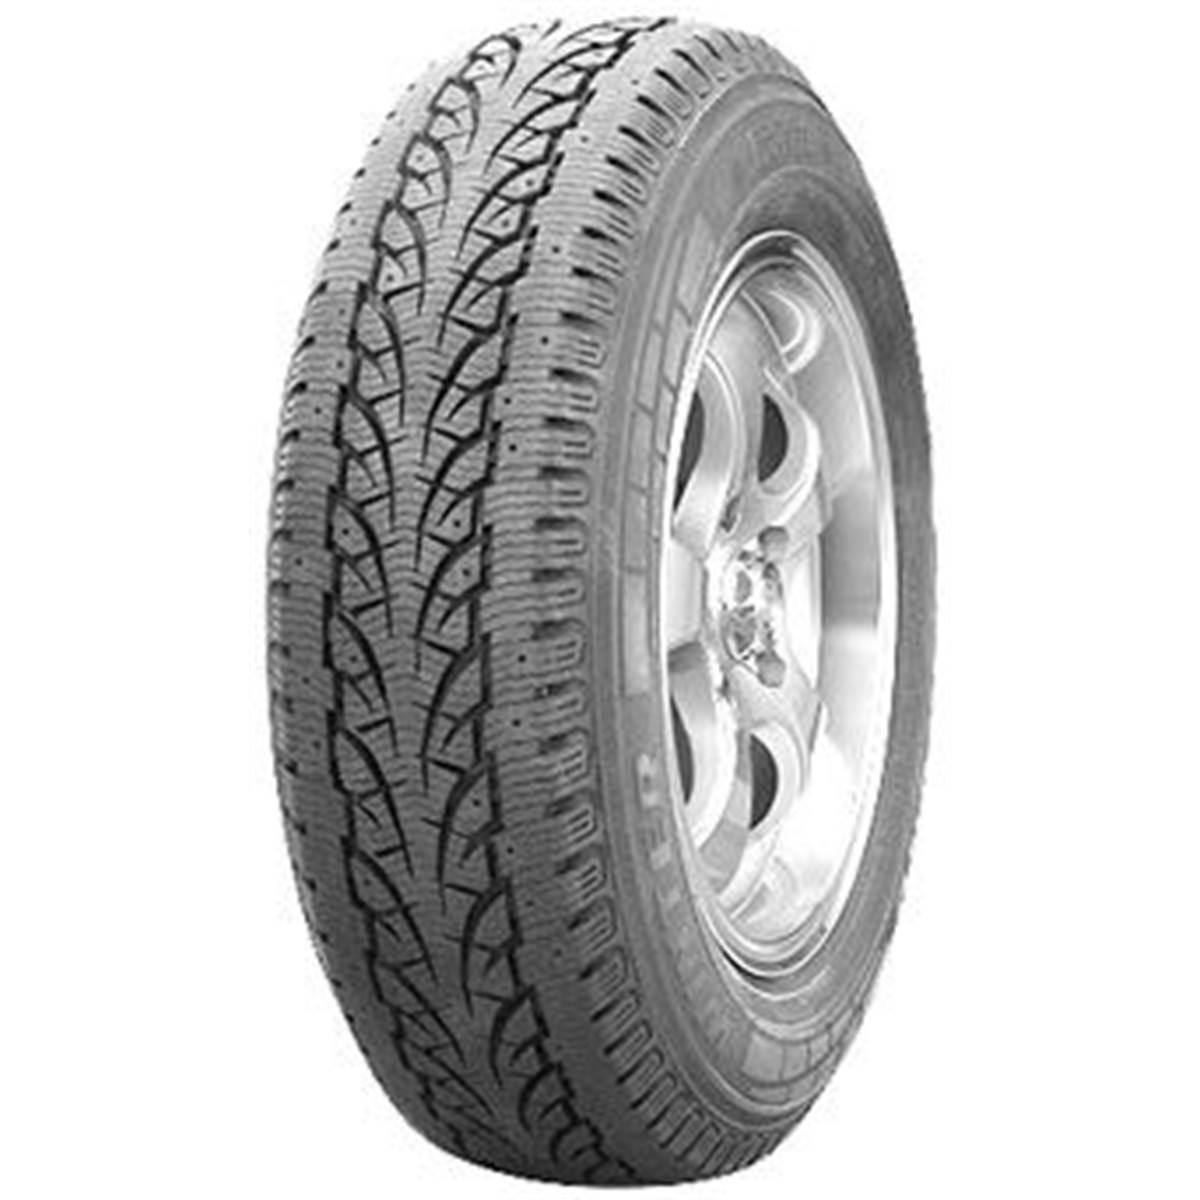 pneu camionnette hiver pirelli 175 65r14 90t chrono winter. Black Bedroom Furniture Sets. Home Design Ideas